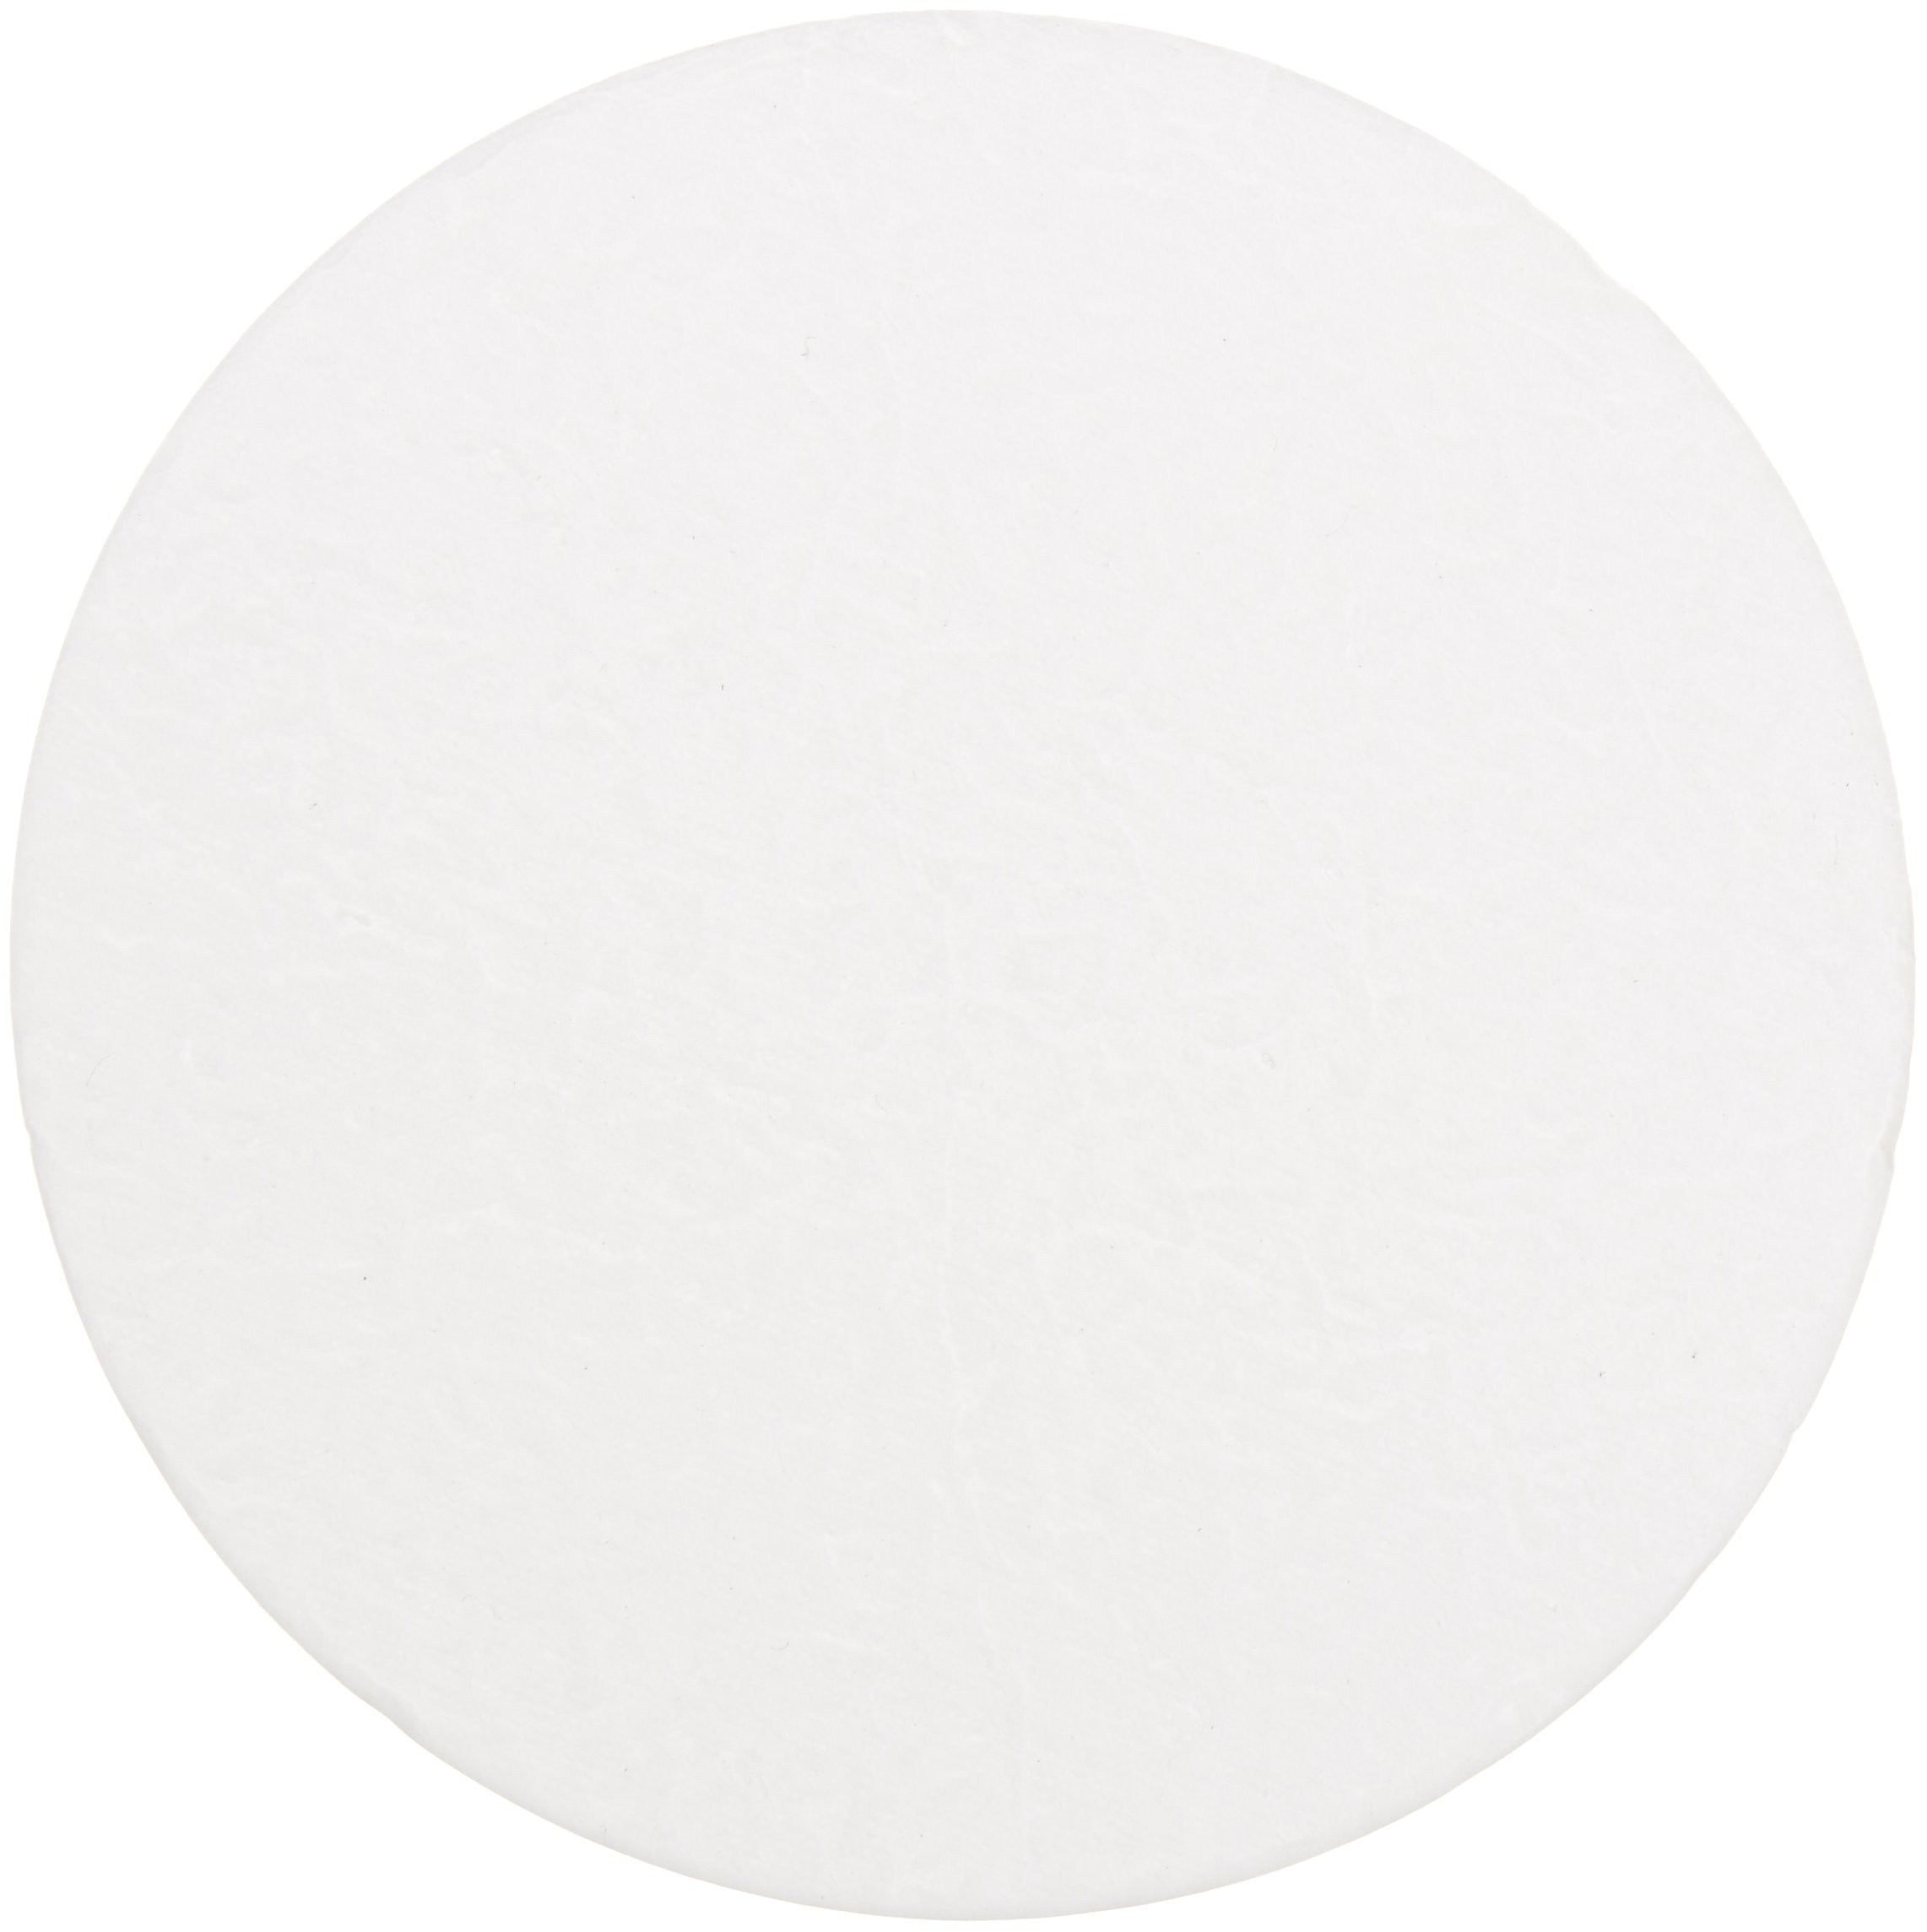 GE Whatman 1823-110 Borosilicate Glass Microfiber Filter, Binder Free, Grade GF/D, Circle, 2.7µm Pore Size, 110mm Diameter (Pack of 25) by Whatman